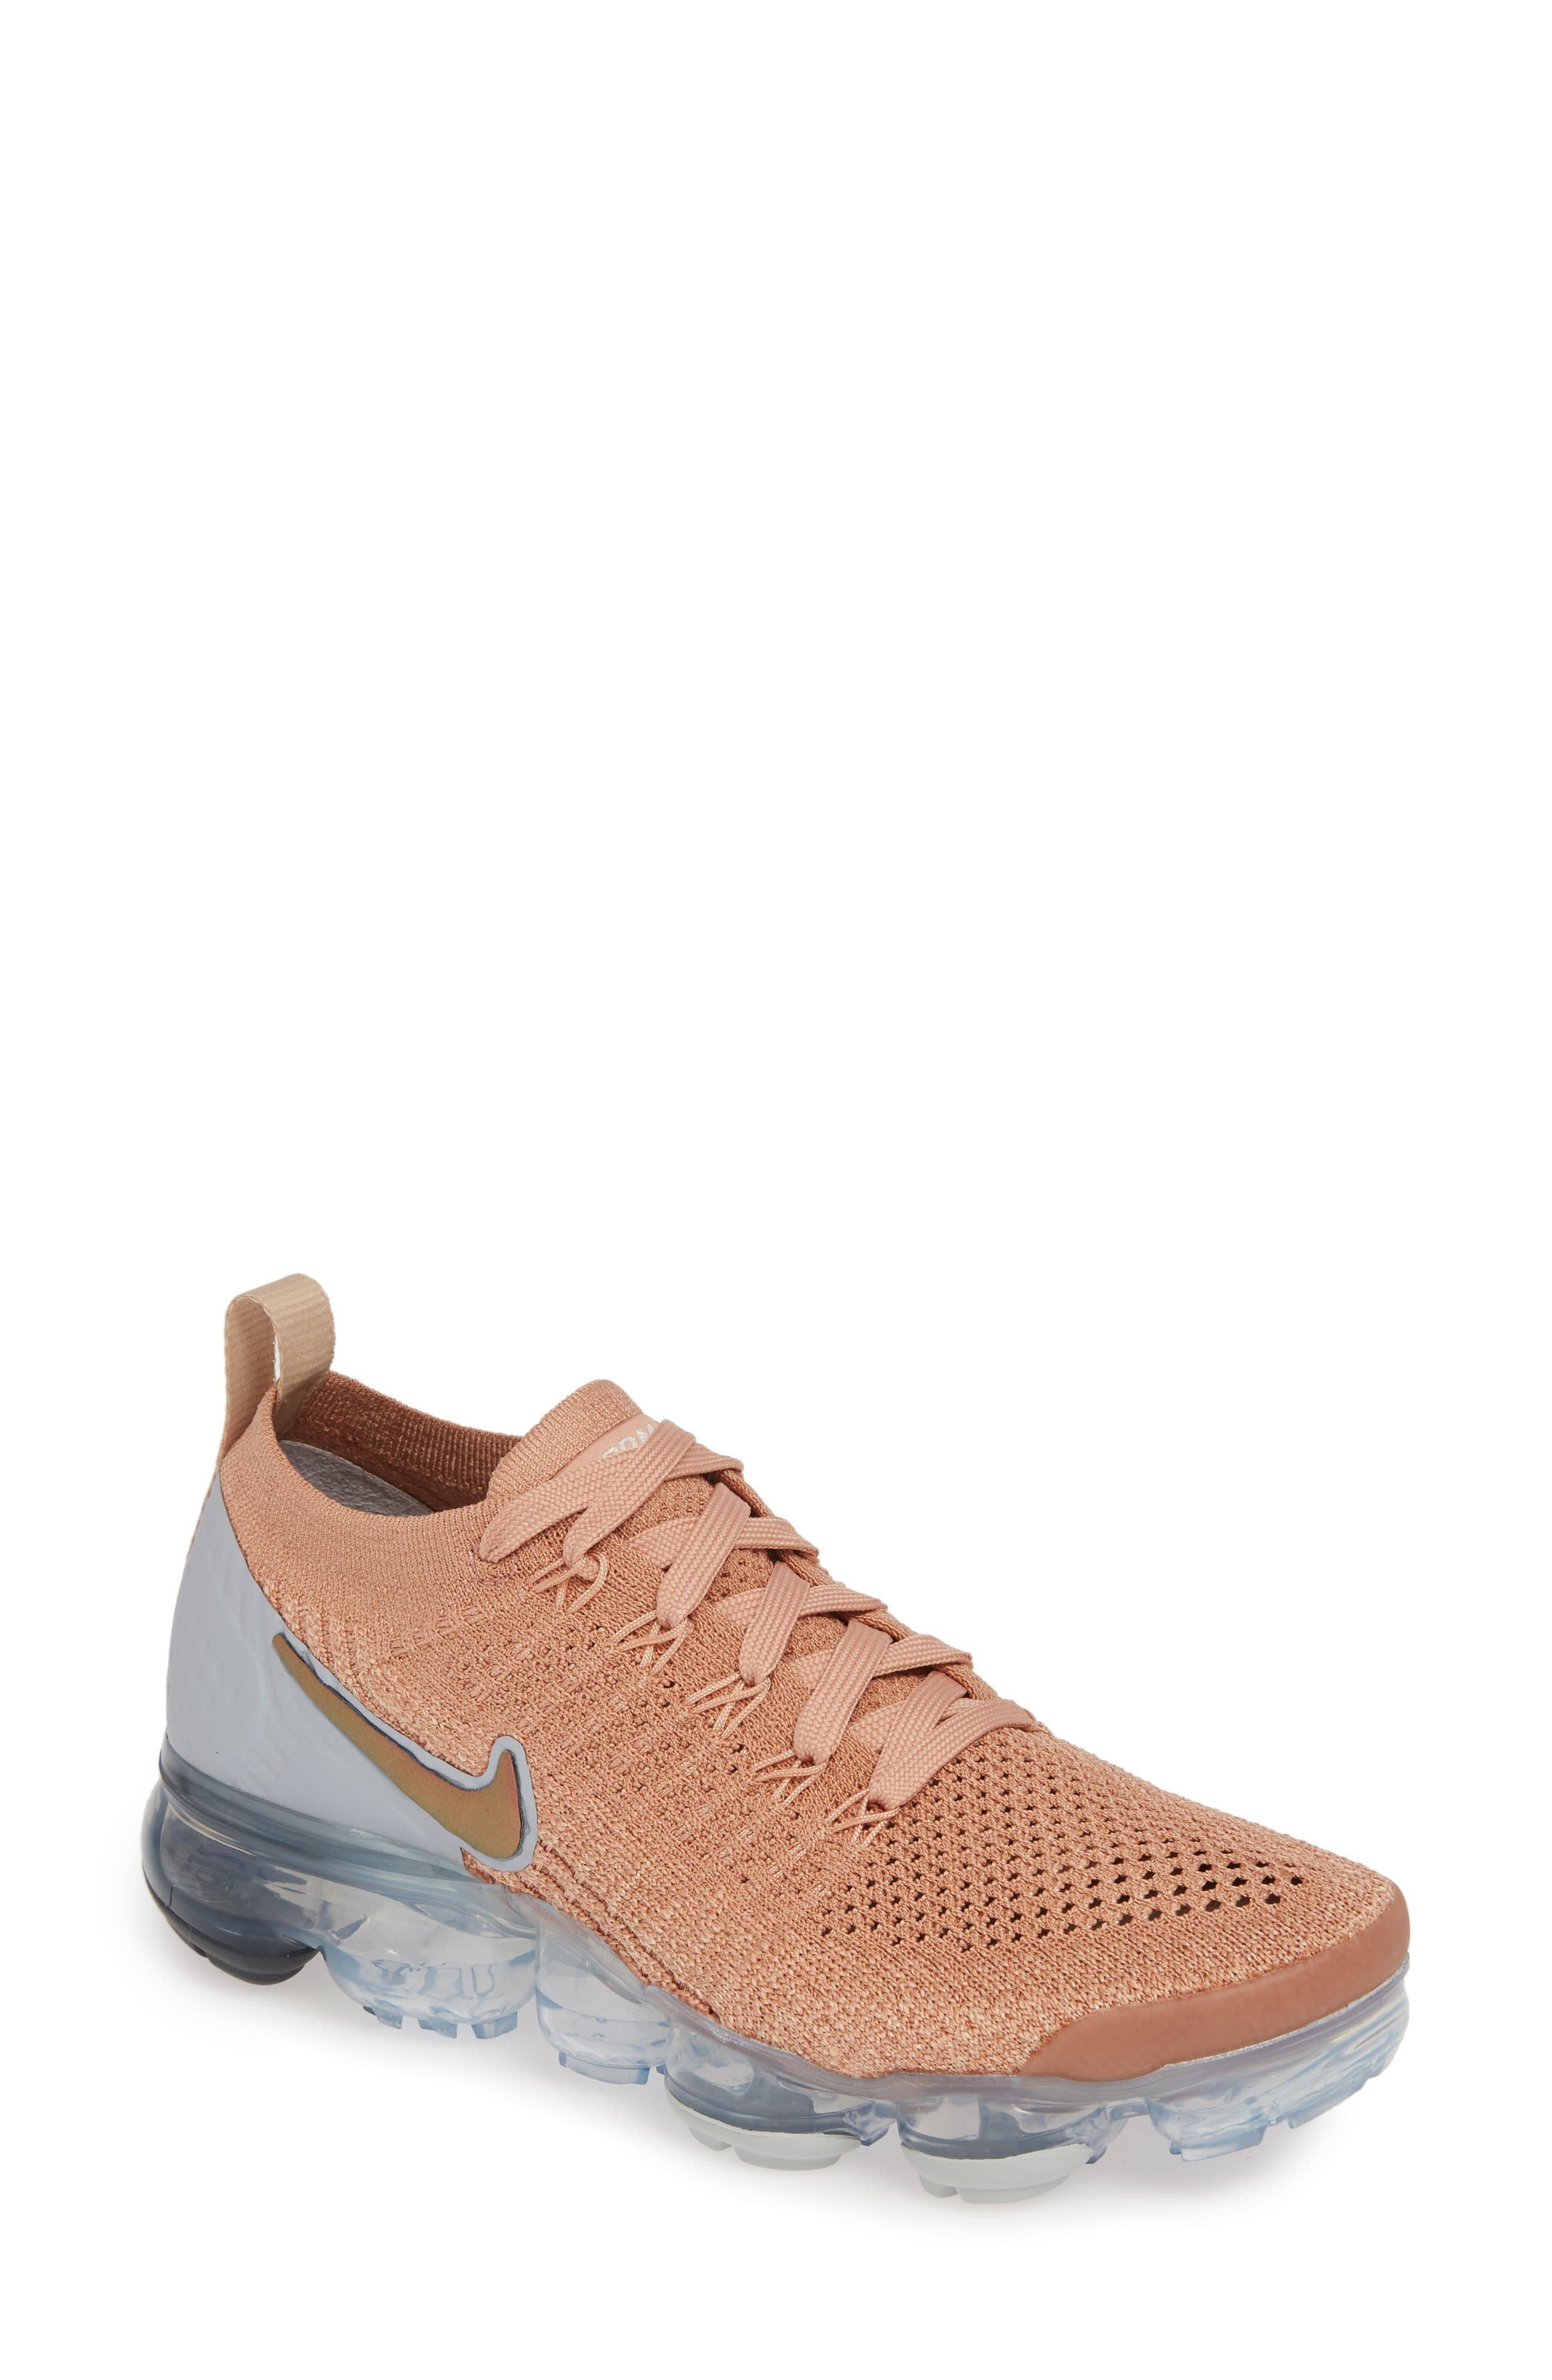 328a32692ce4 Nike Air Vapormax Flyknit 2 Running Shoe In Rose Gold  Bio Beige ...